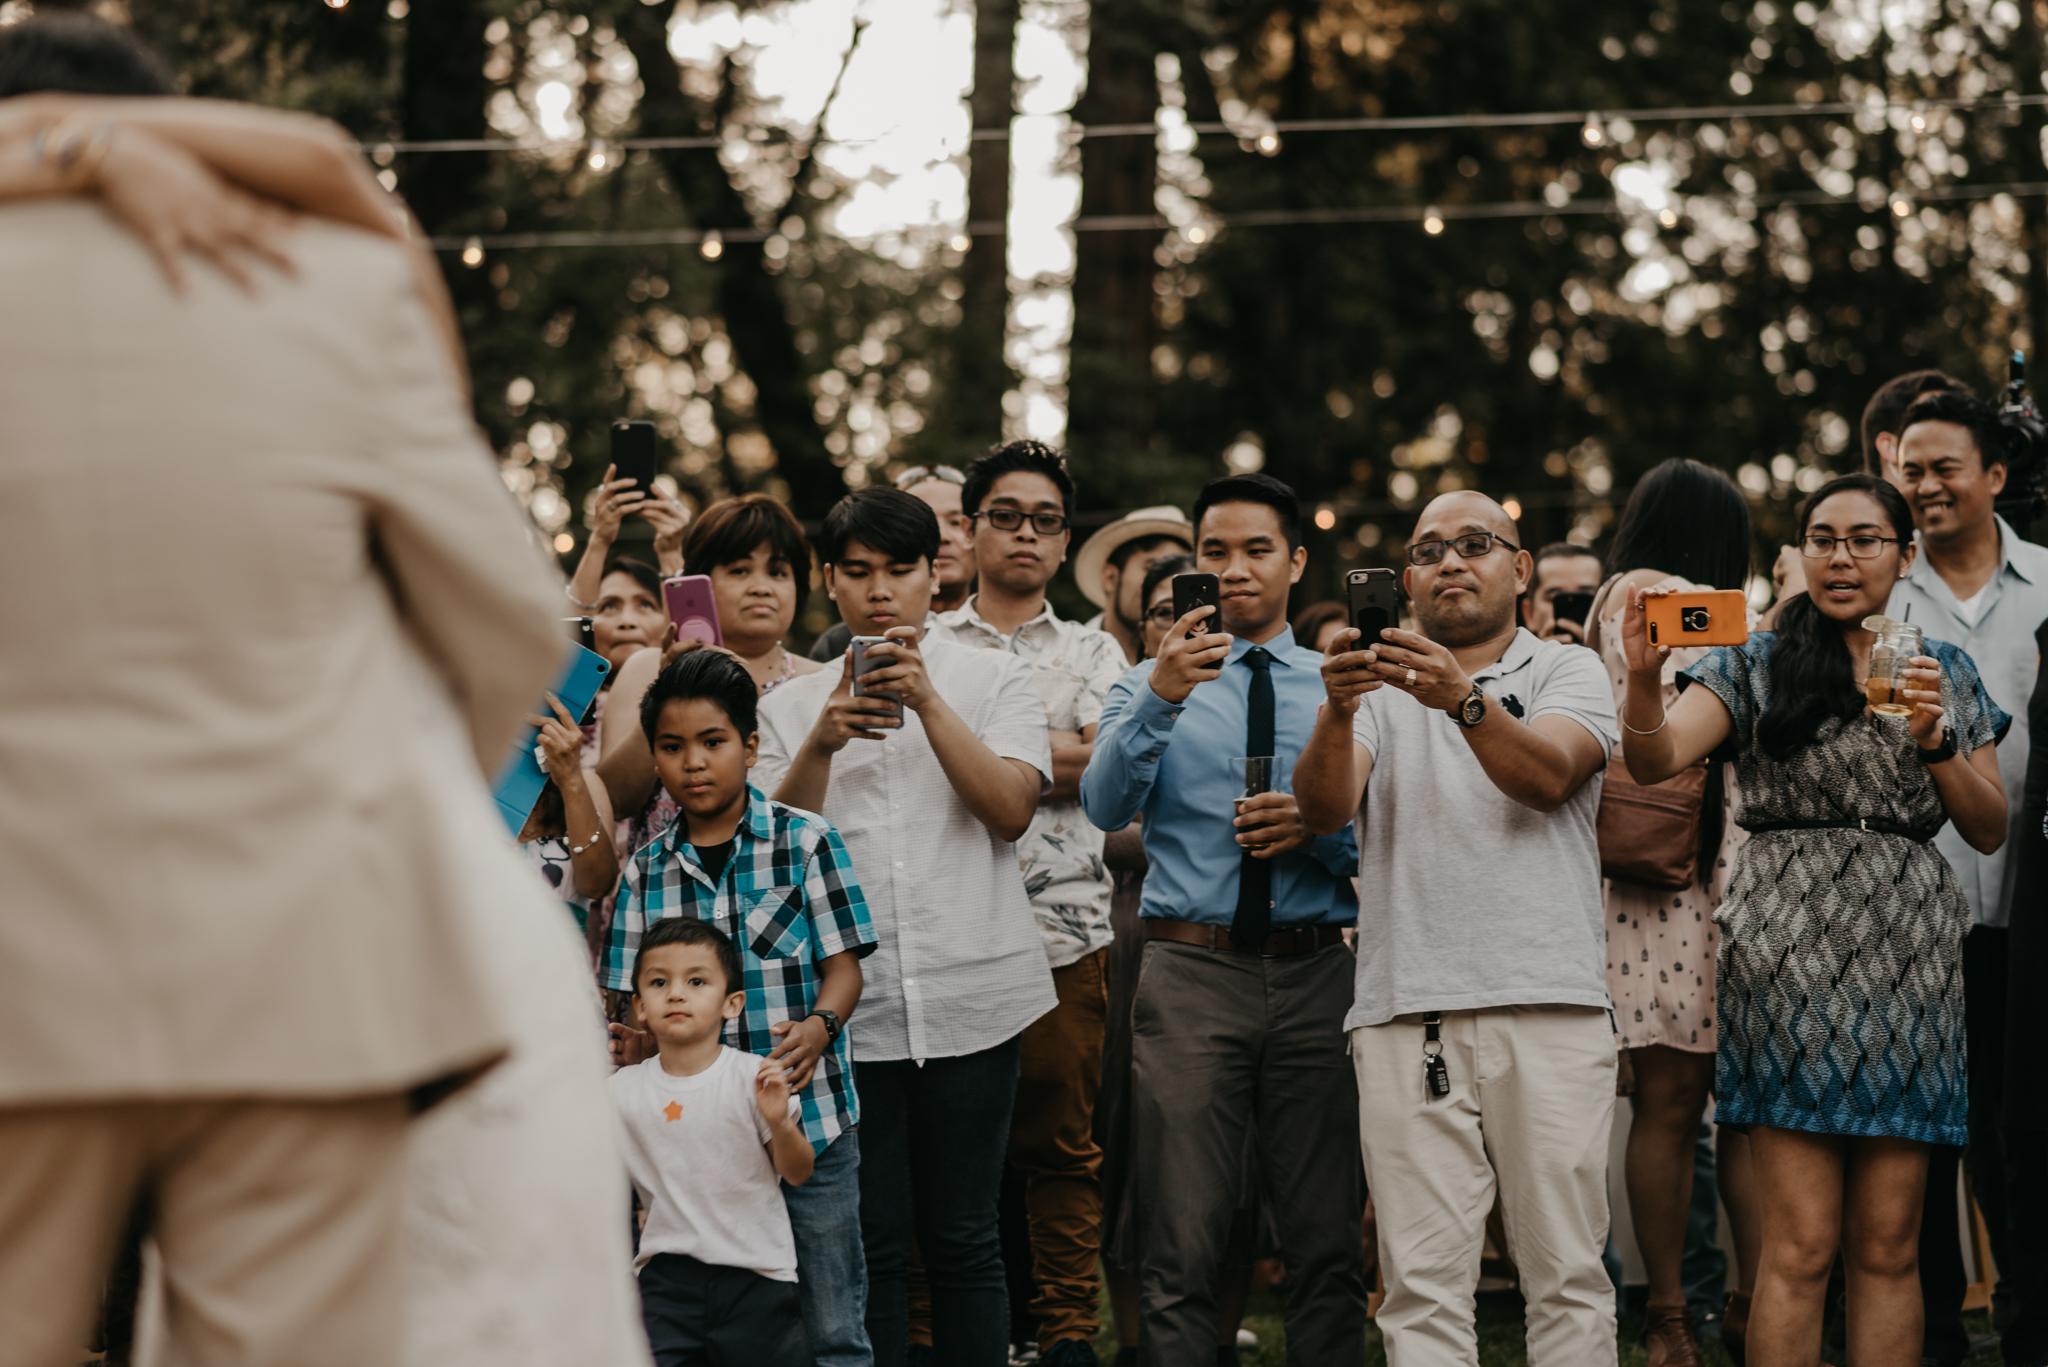 © Isaiah + Taylor Photography - Evergreen Lodge Destination Yoesmite Wedding - Los Angeles Wedding Photographer-193.jpg